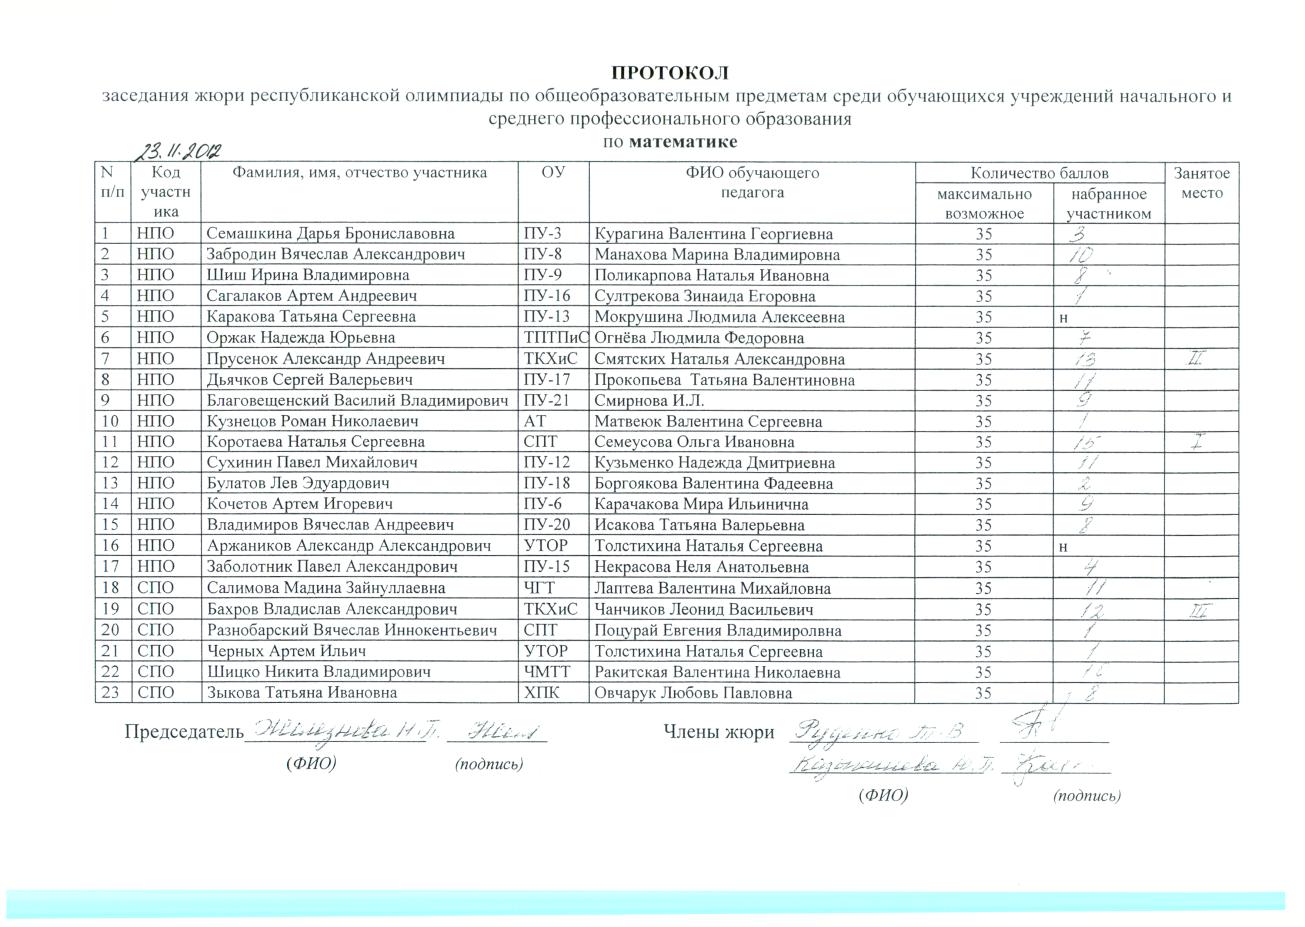 D:\Documents and Settings\буг\Мои документы\Некрасова0005.tif